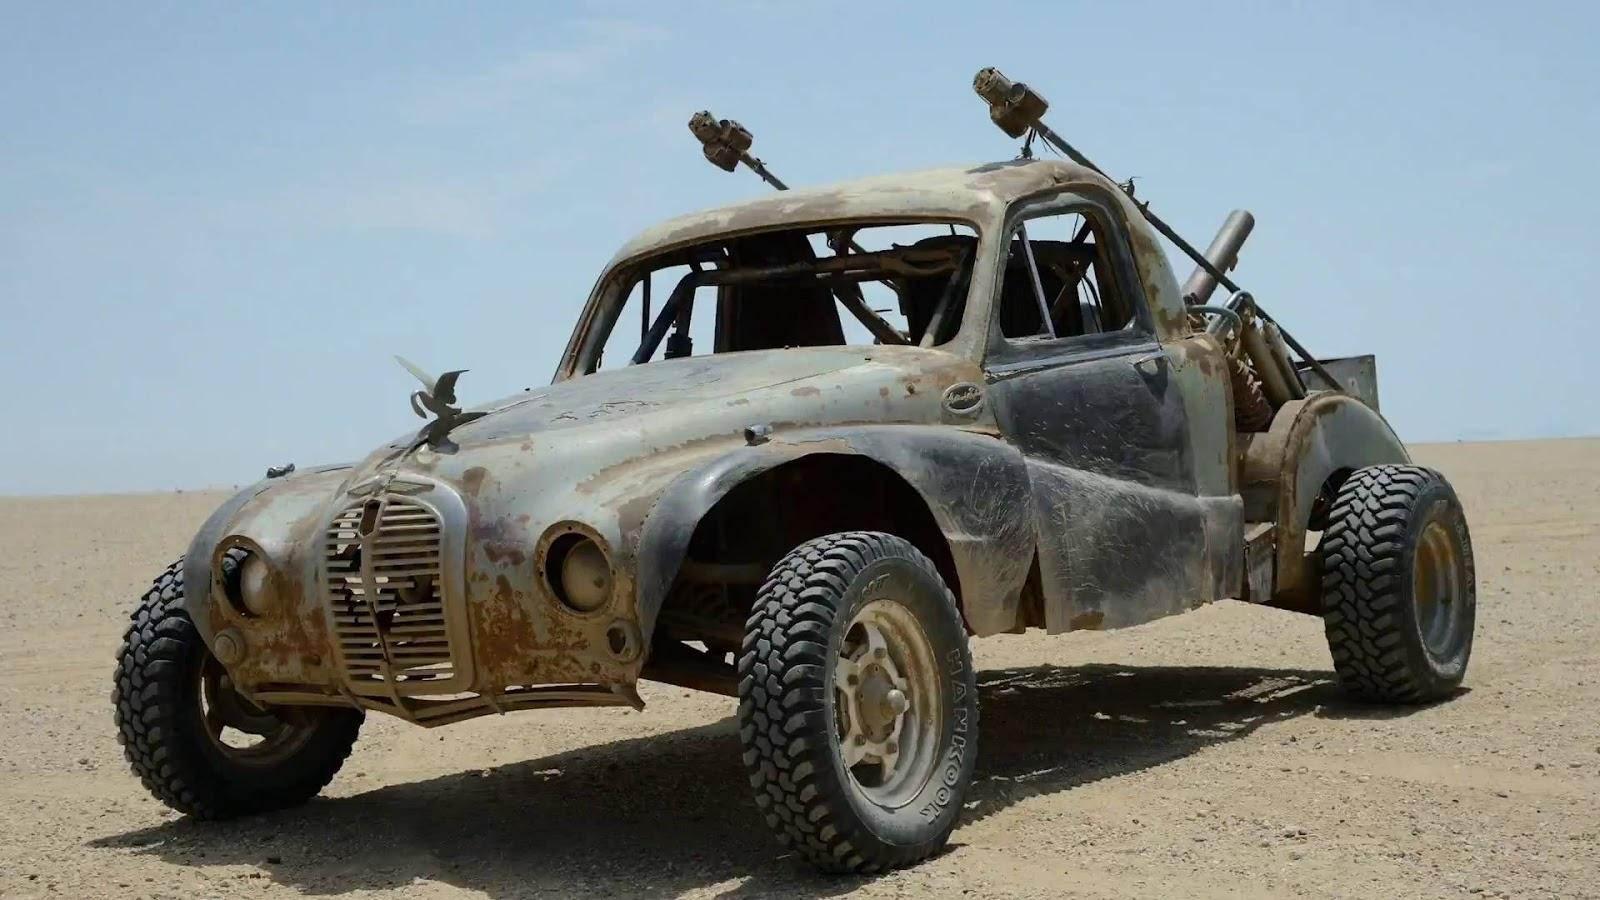 4k Wallpaper Muscle Car Fury Road Vehicles Buggy 7